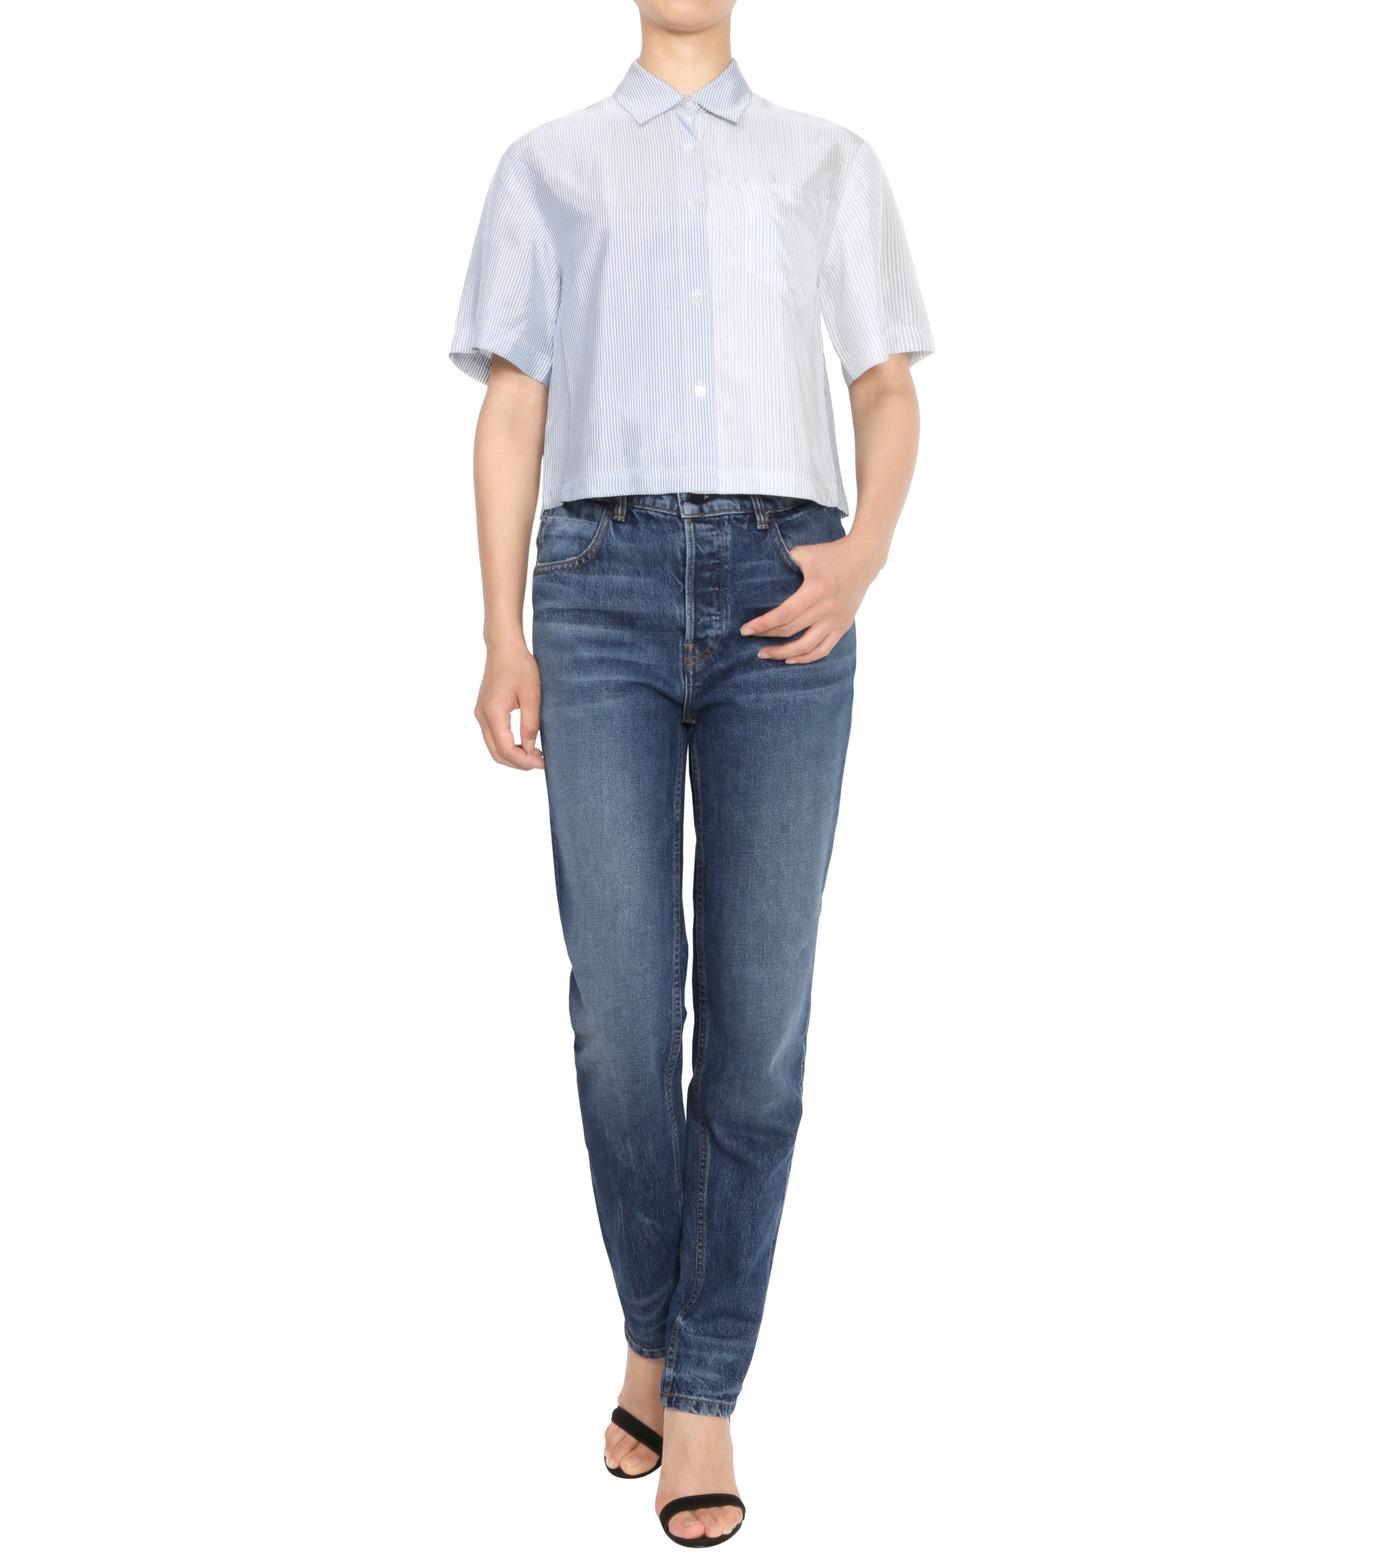 T by Alexander Wang(ティーバイ アレキサンダーワン)のWashed Stripe SS Shirt-NAVY(シャツ/shirt)-403202P16-93 拡大詳細画像3